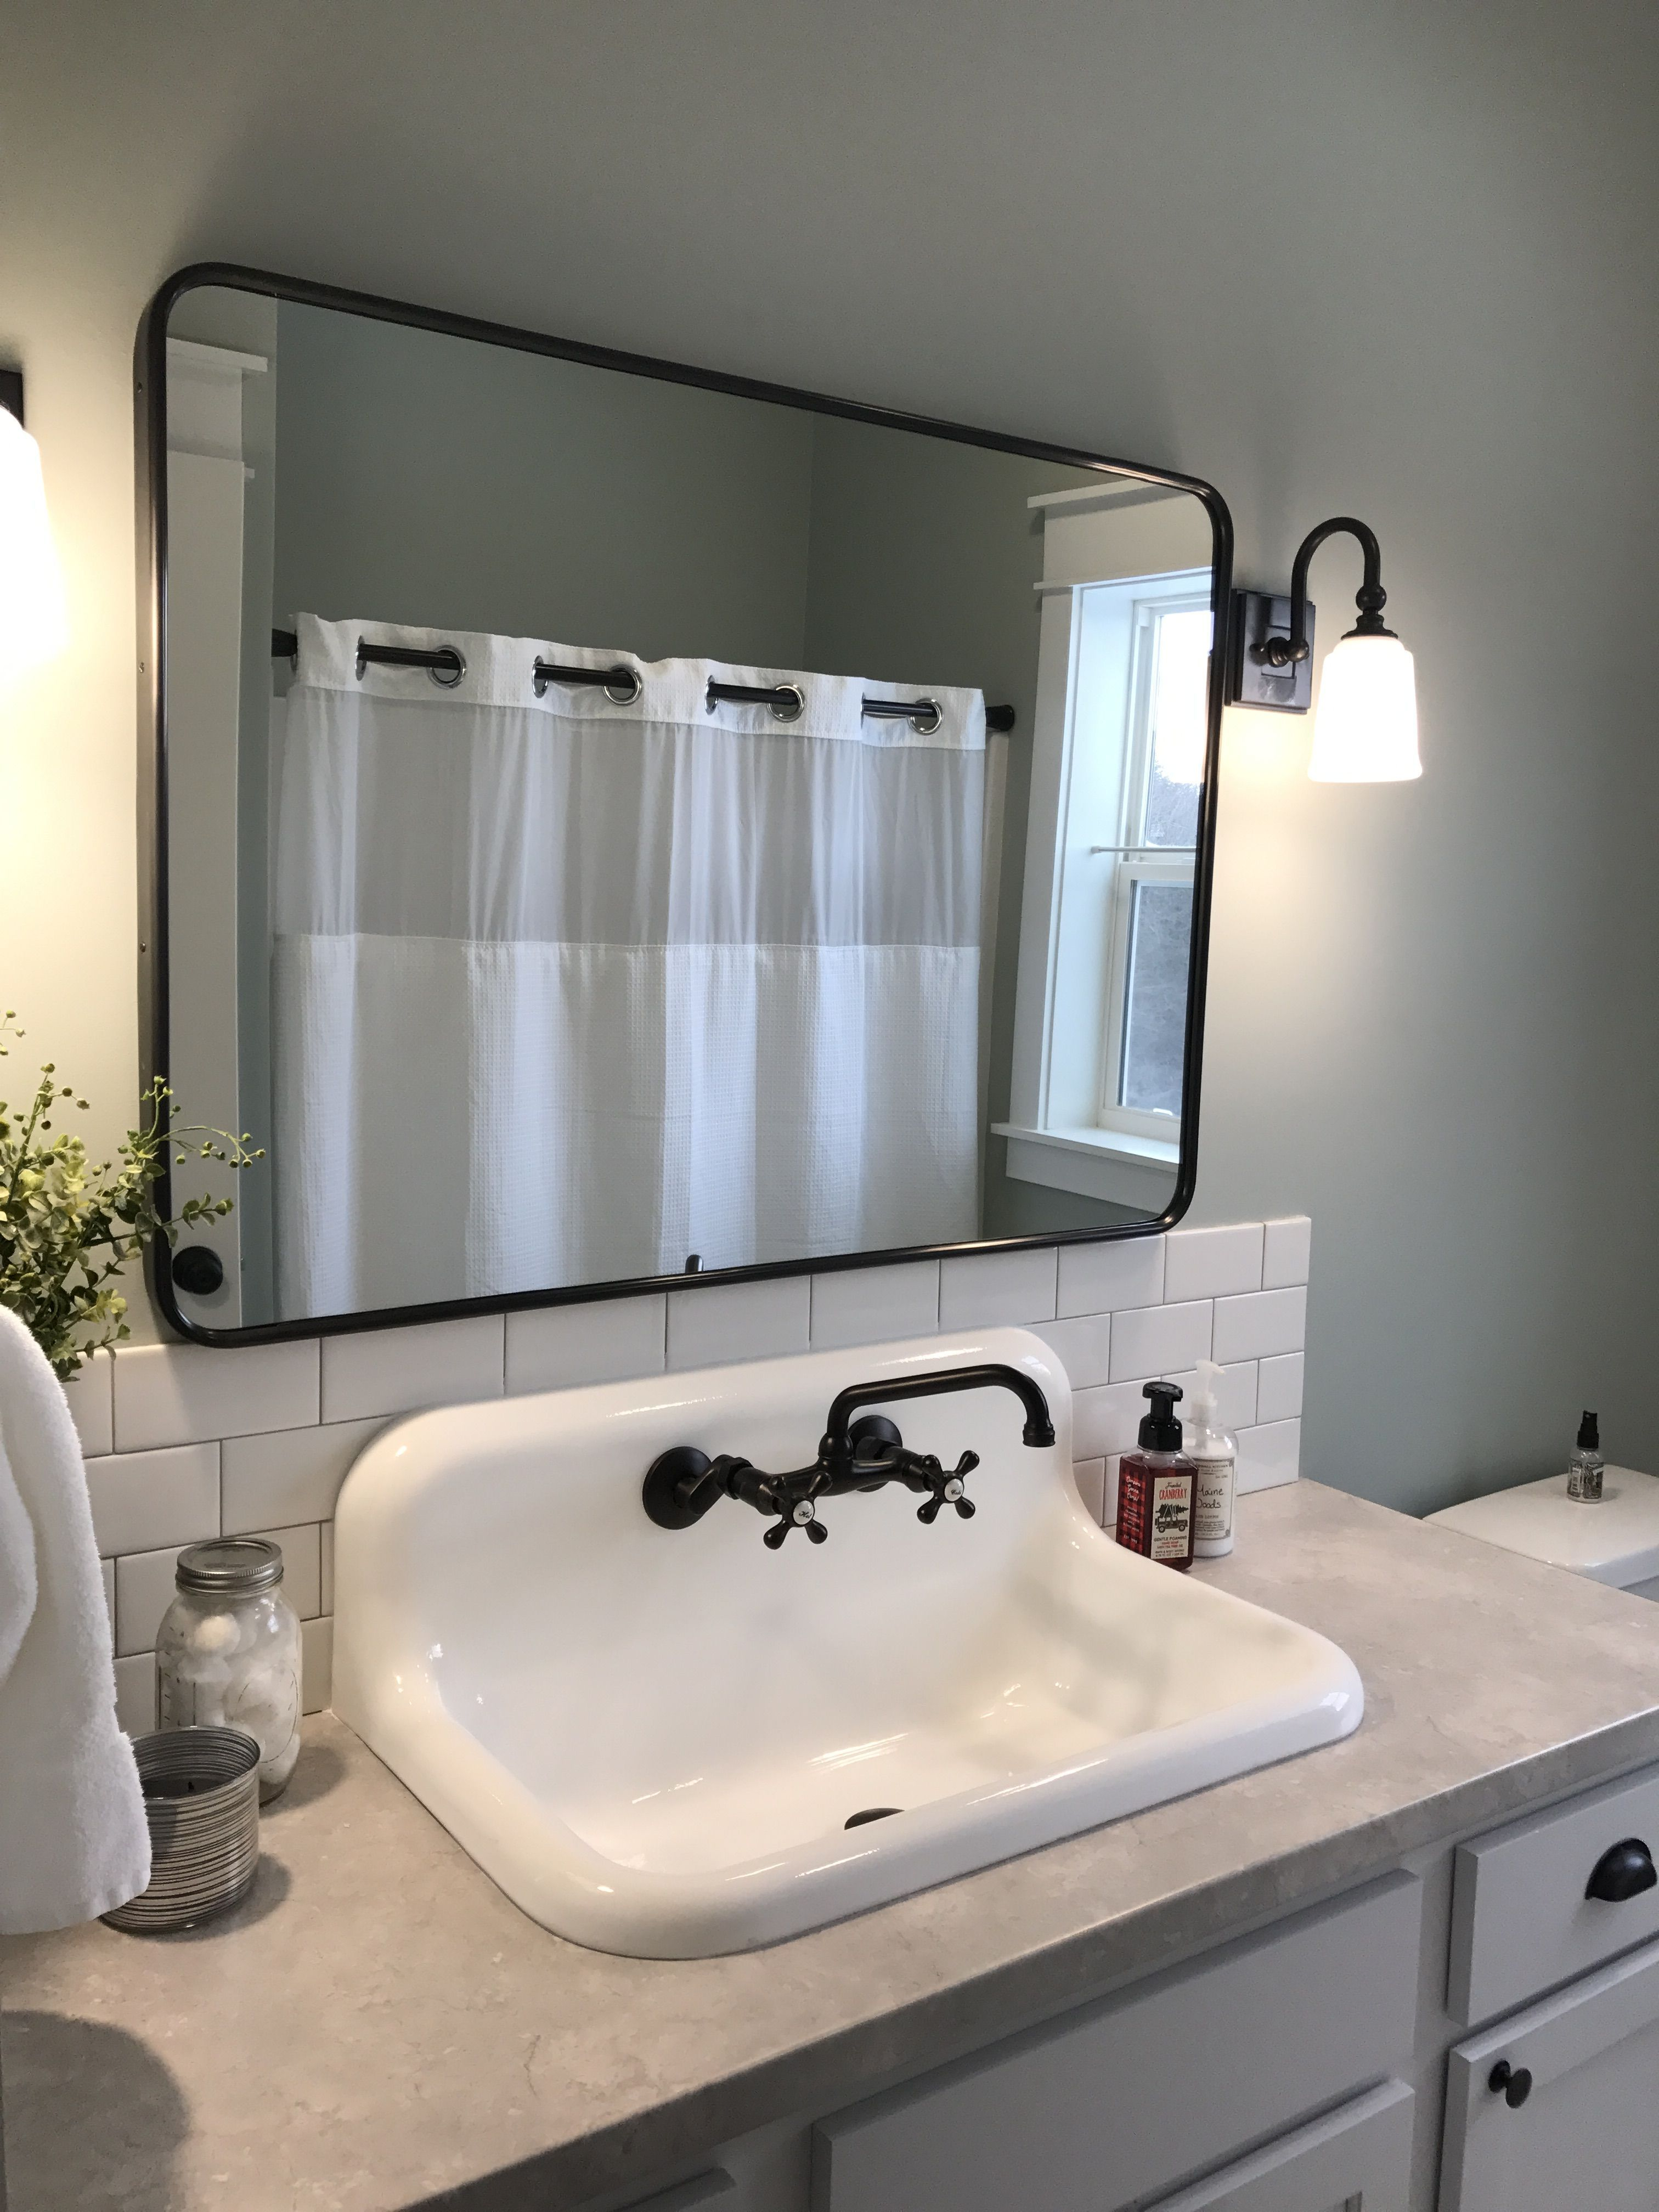 10 Impressive Rustic Diy Sink Vanity Farmhouse Style Farmhouse Bathroom Sink Vintage Bathroom Sinks Bathroom Remodel Cost